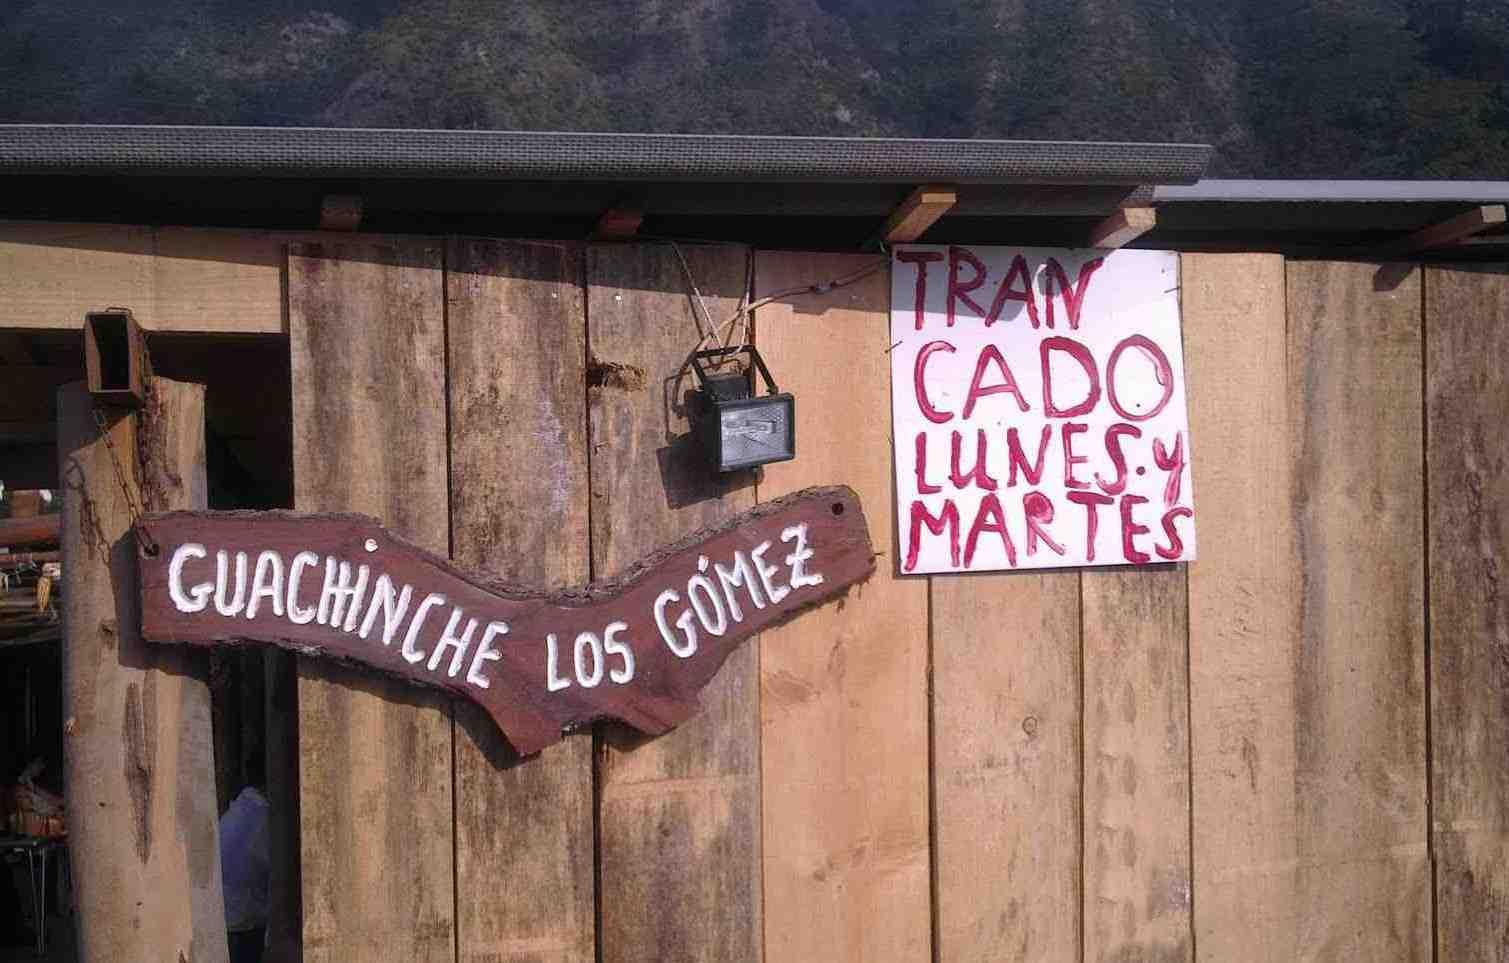 FOTO 3.- GUACHINCHE LOS GÓMEZ